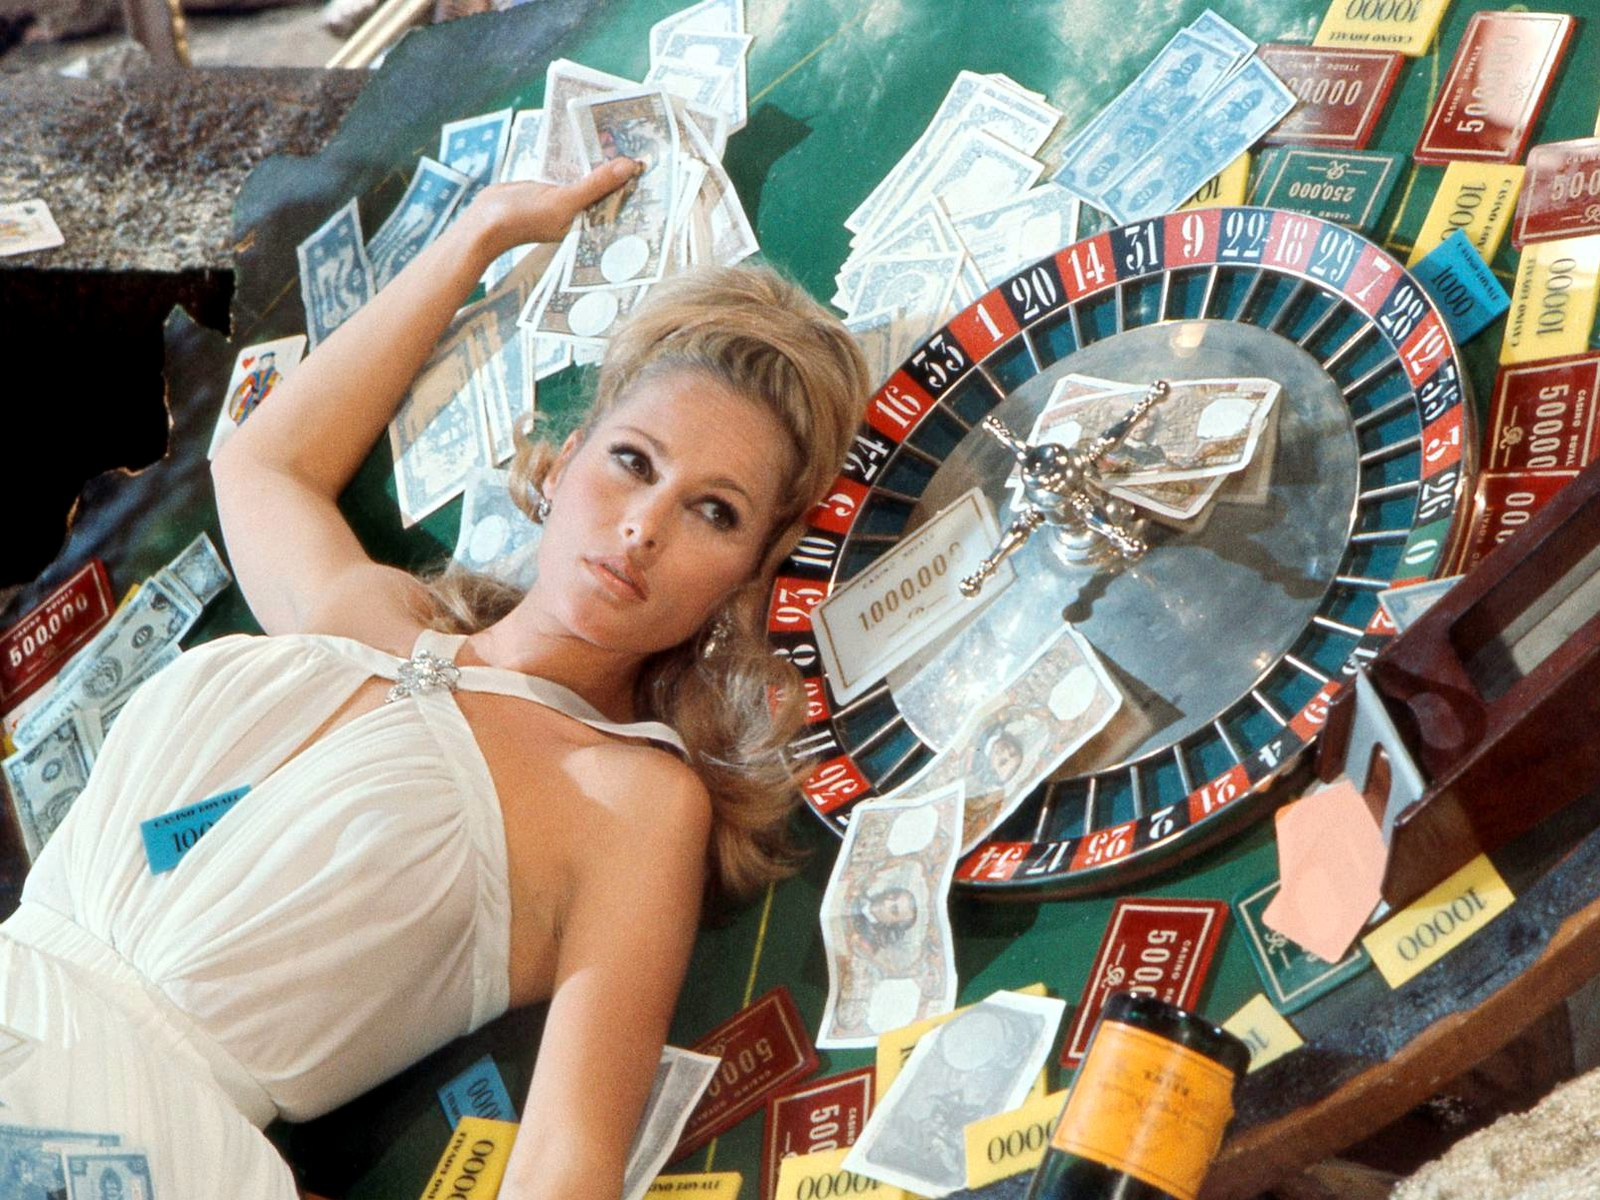 Sky bier haus vegas play gaming wms at slot casino